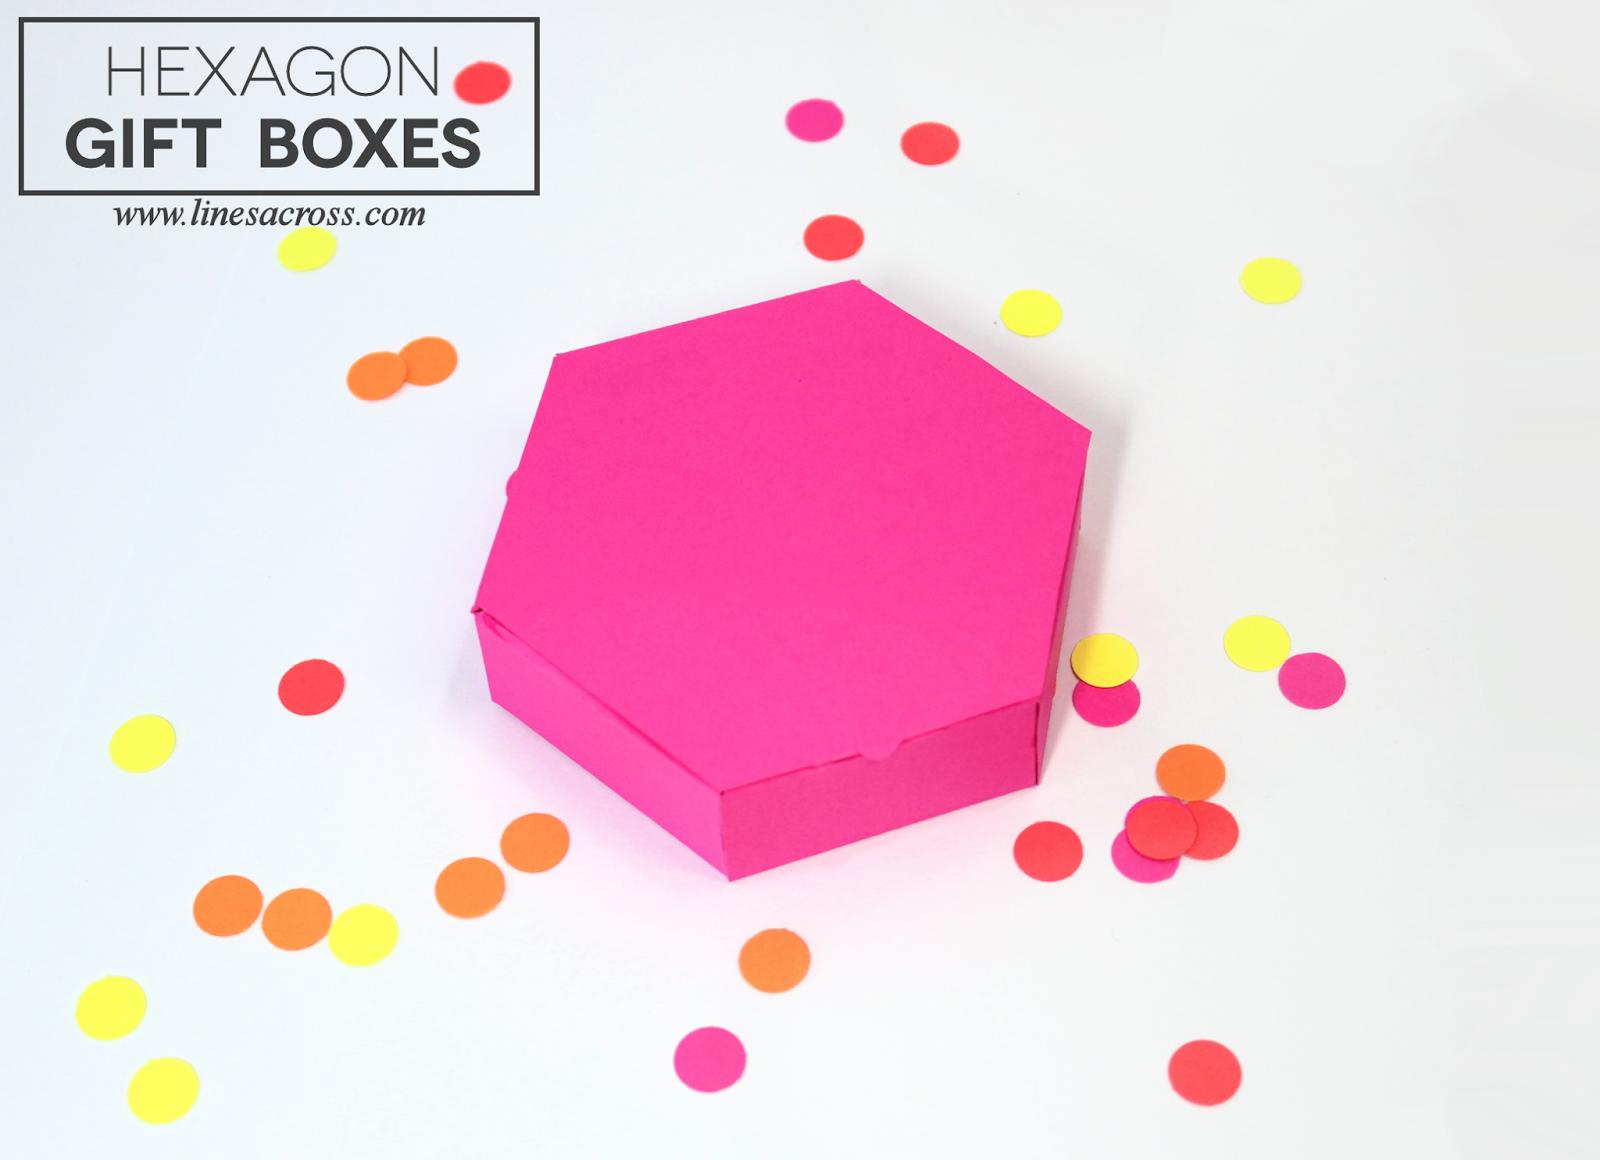 3bpblogspot HQfX3mfhc I UpD PnYHFoI AAAAAAAAKbs VDLYfPAa1xY S1600 Hexagon Gift Boxes Lines Across